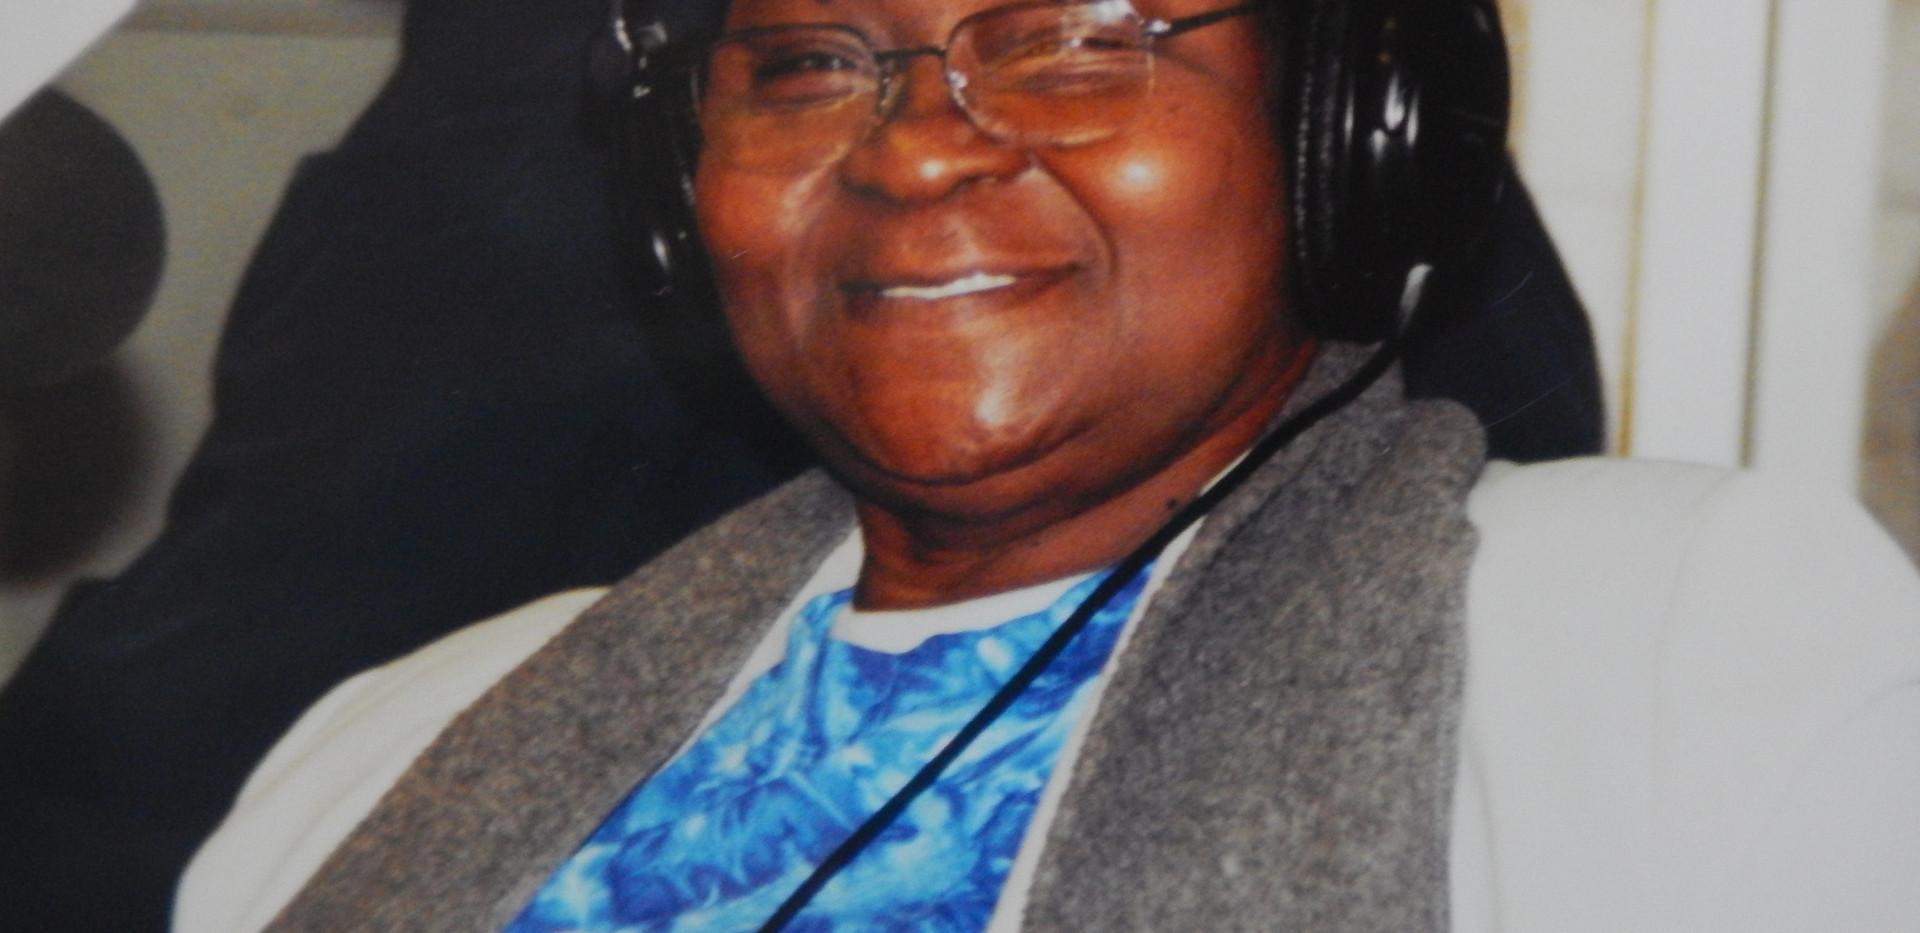 The reigning Calypson Queen of Tobago Calypso Rose at KKUP radio Santa Clara